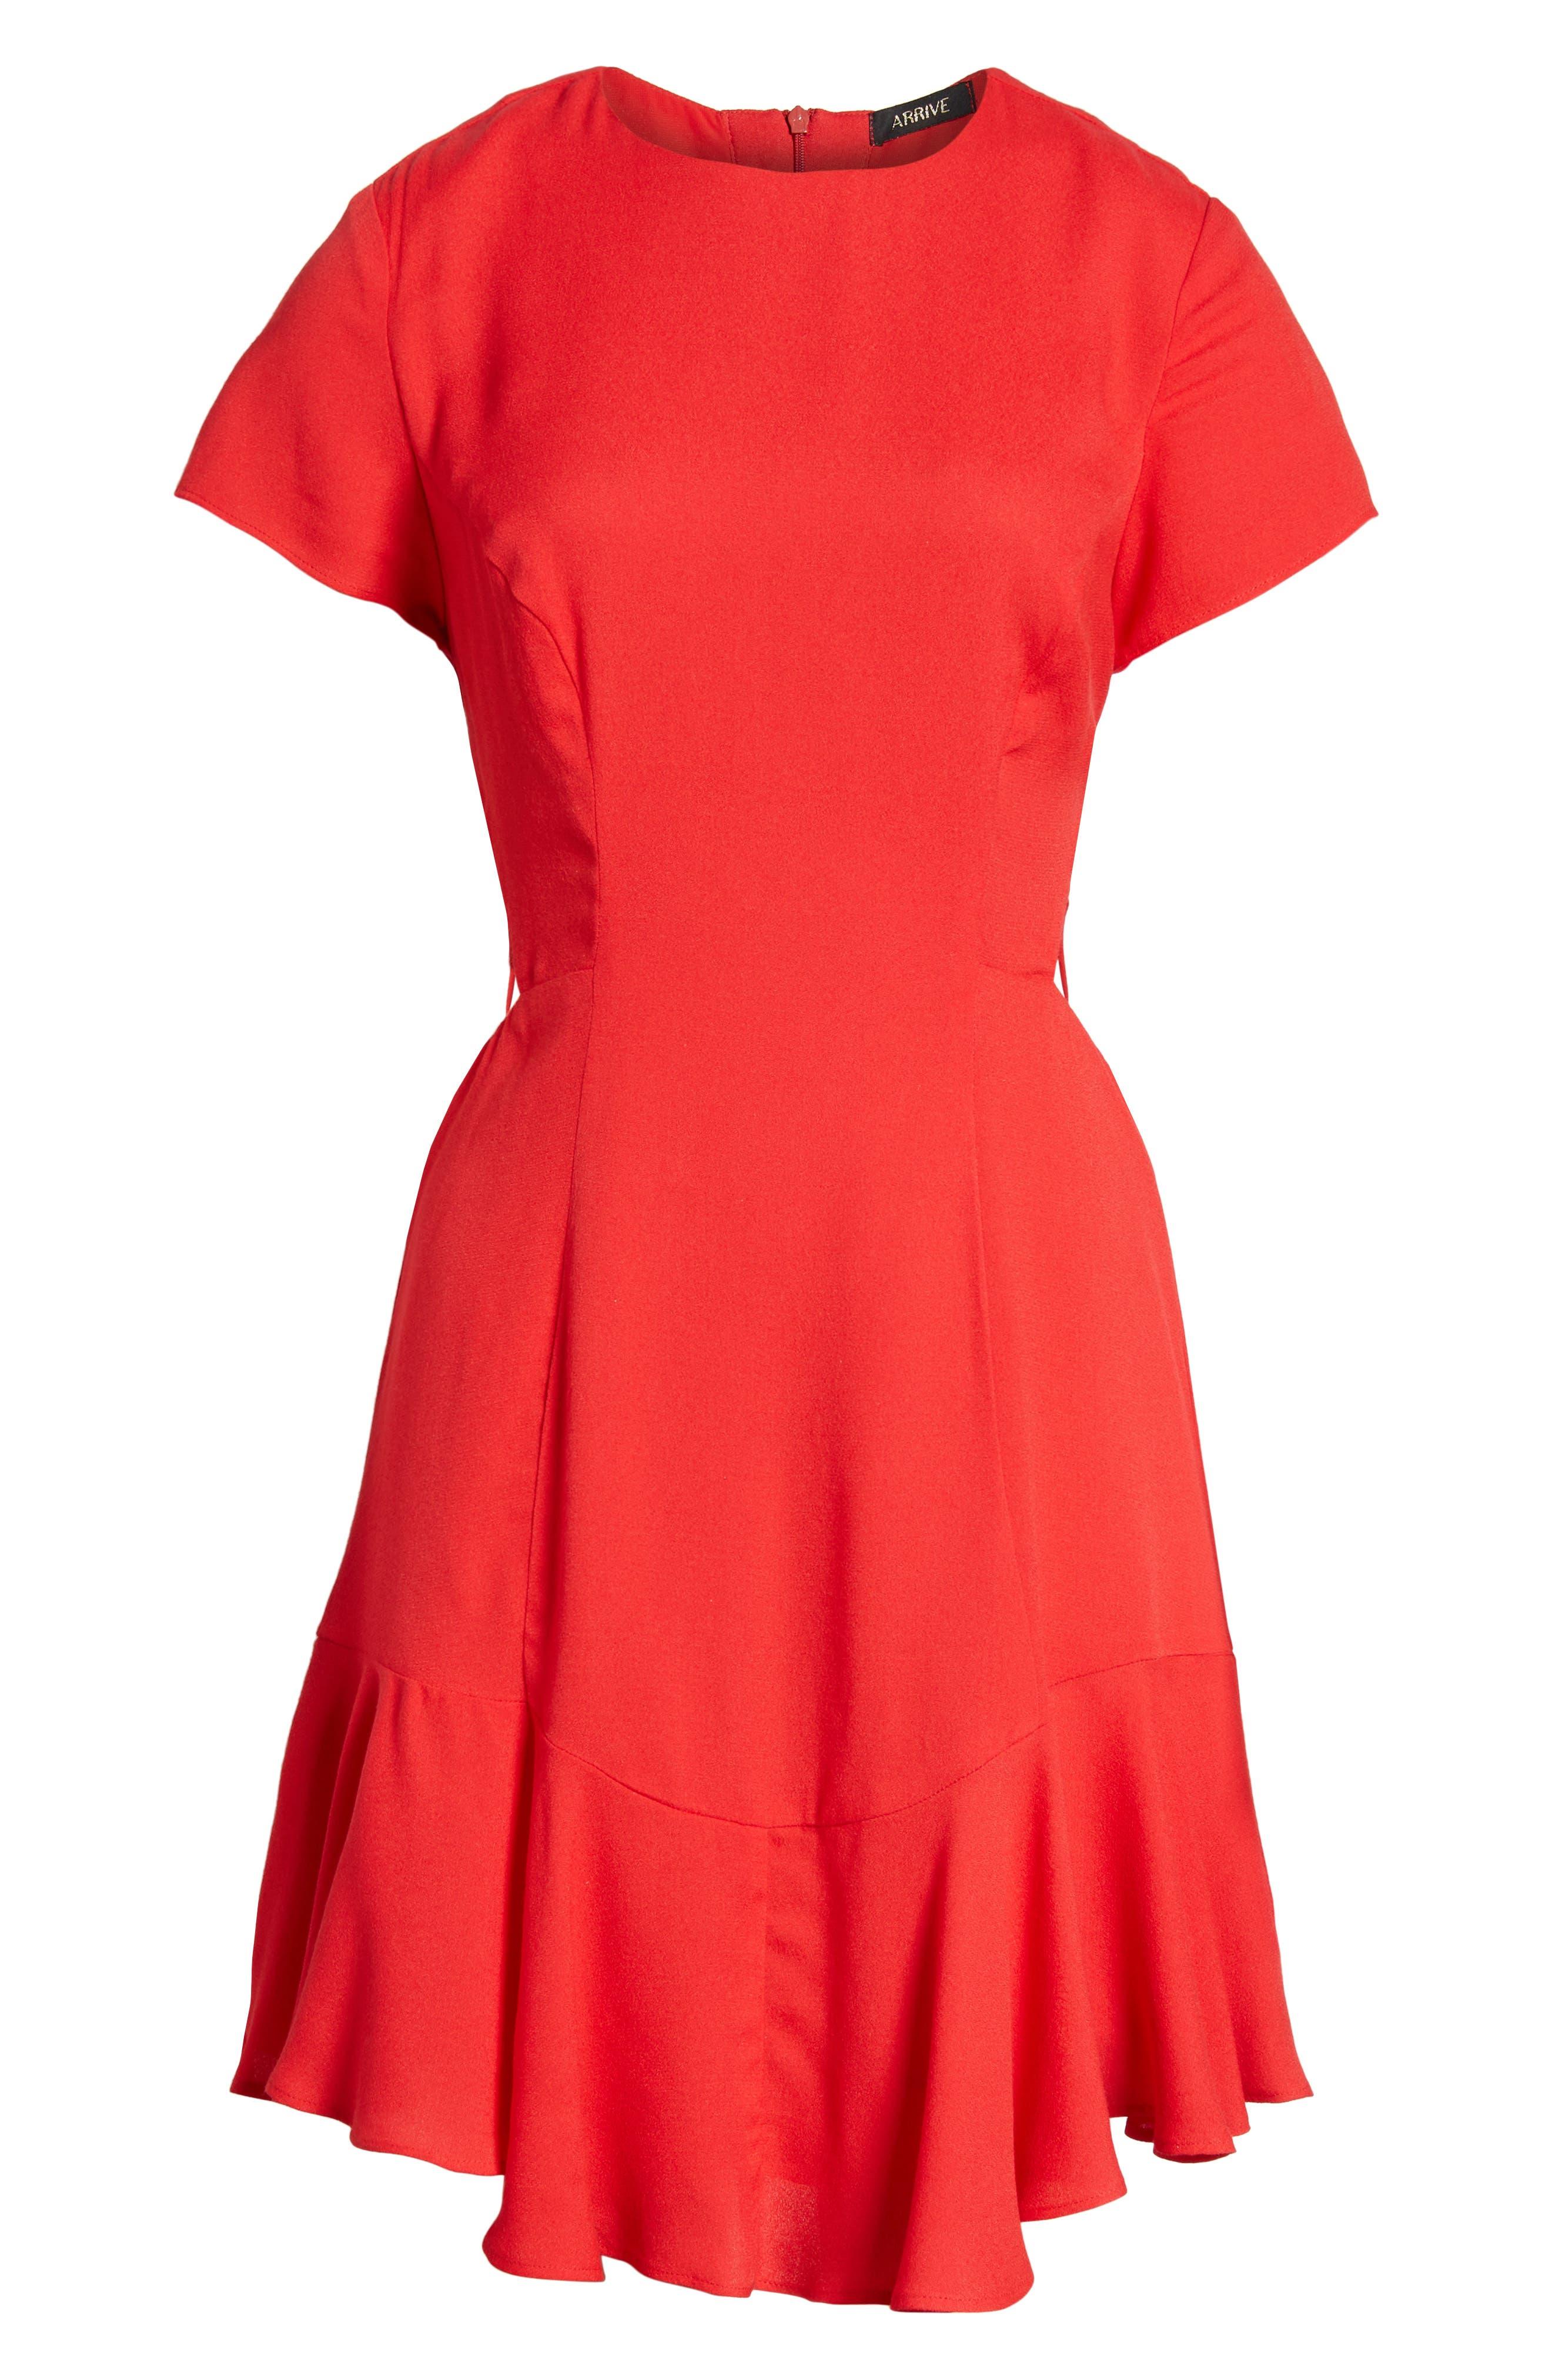 Chelsea Lattice Back Fit & Flare Dress,                             Alternate thumbnail 6, color,                             Red